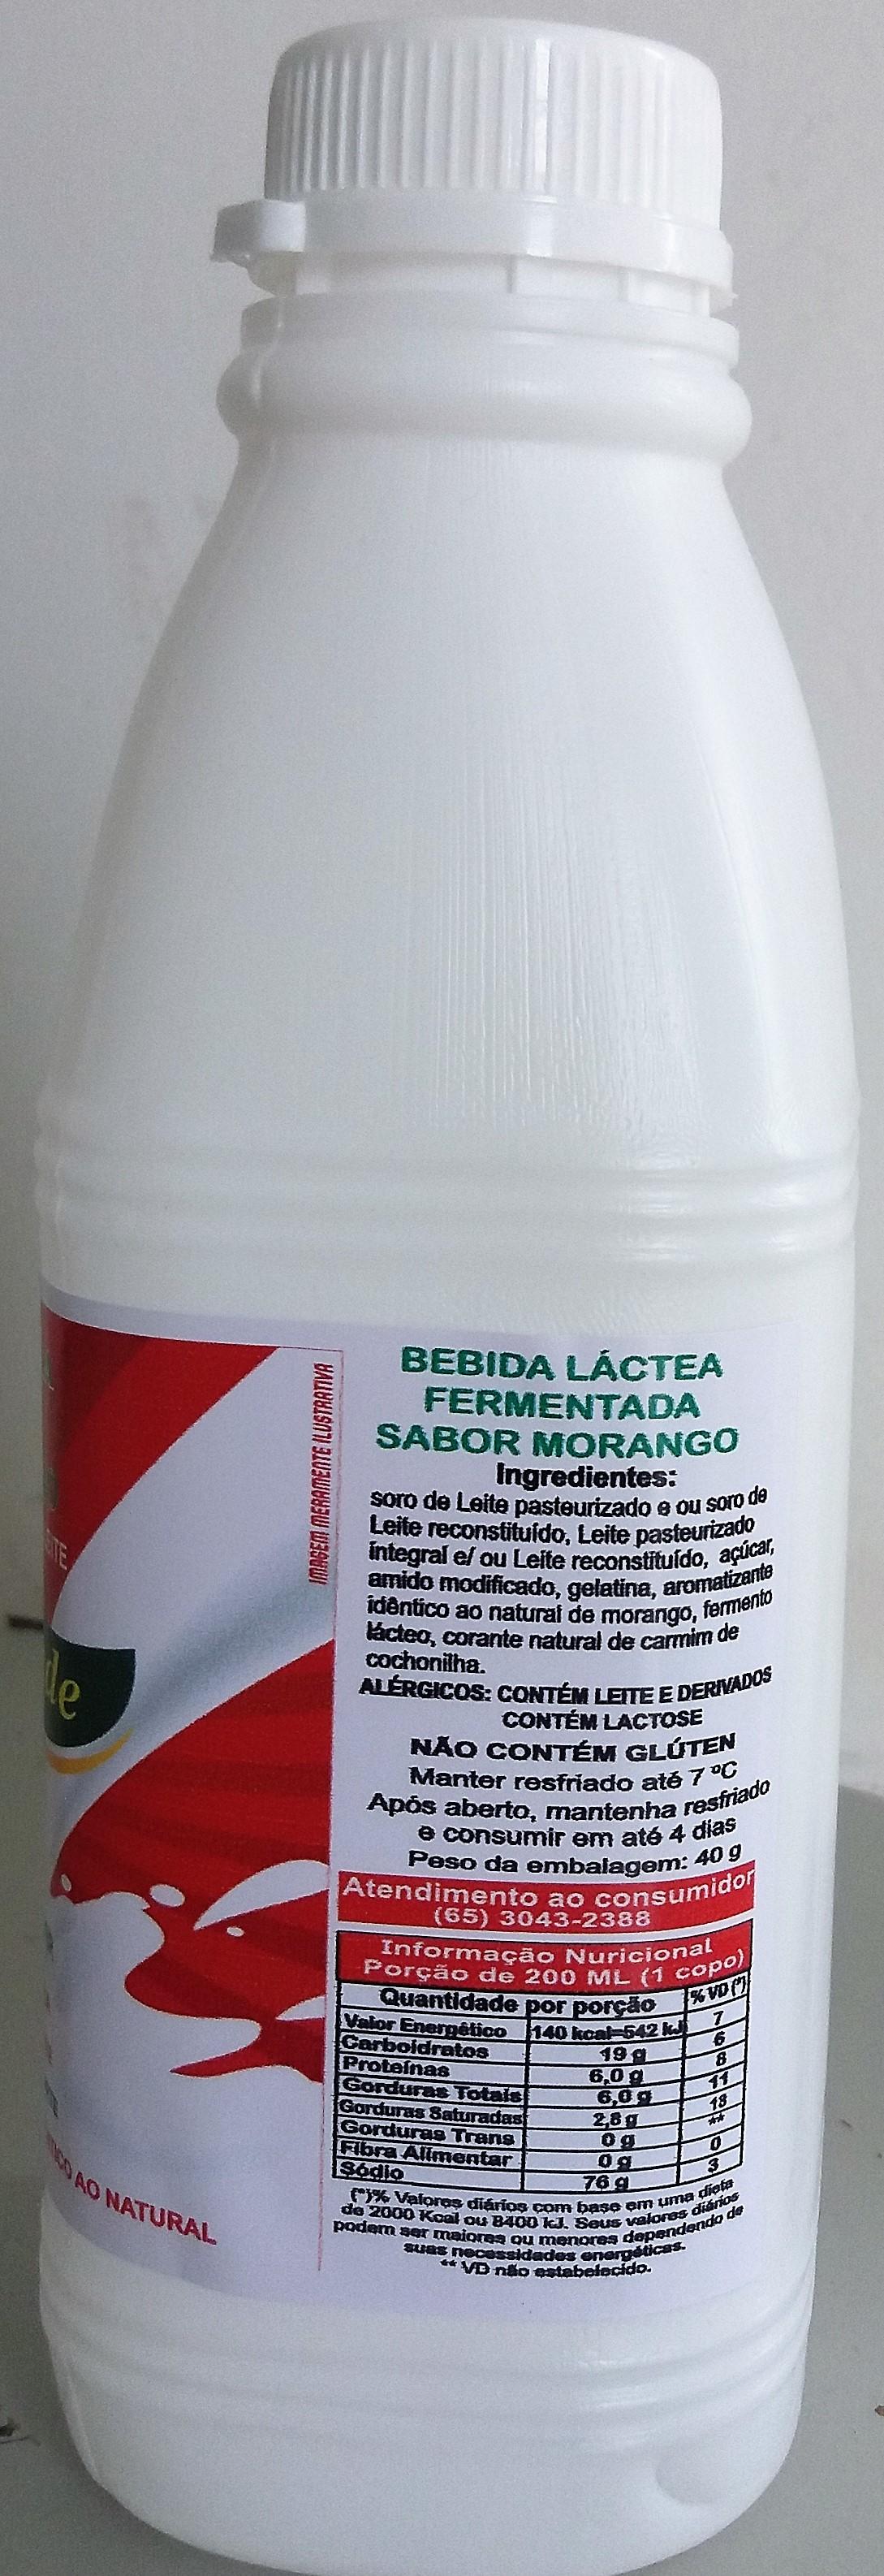 Bebida Láctea com preparado de morango